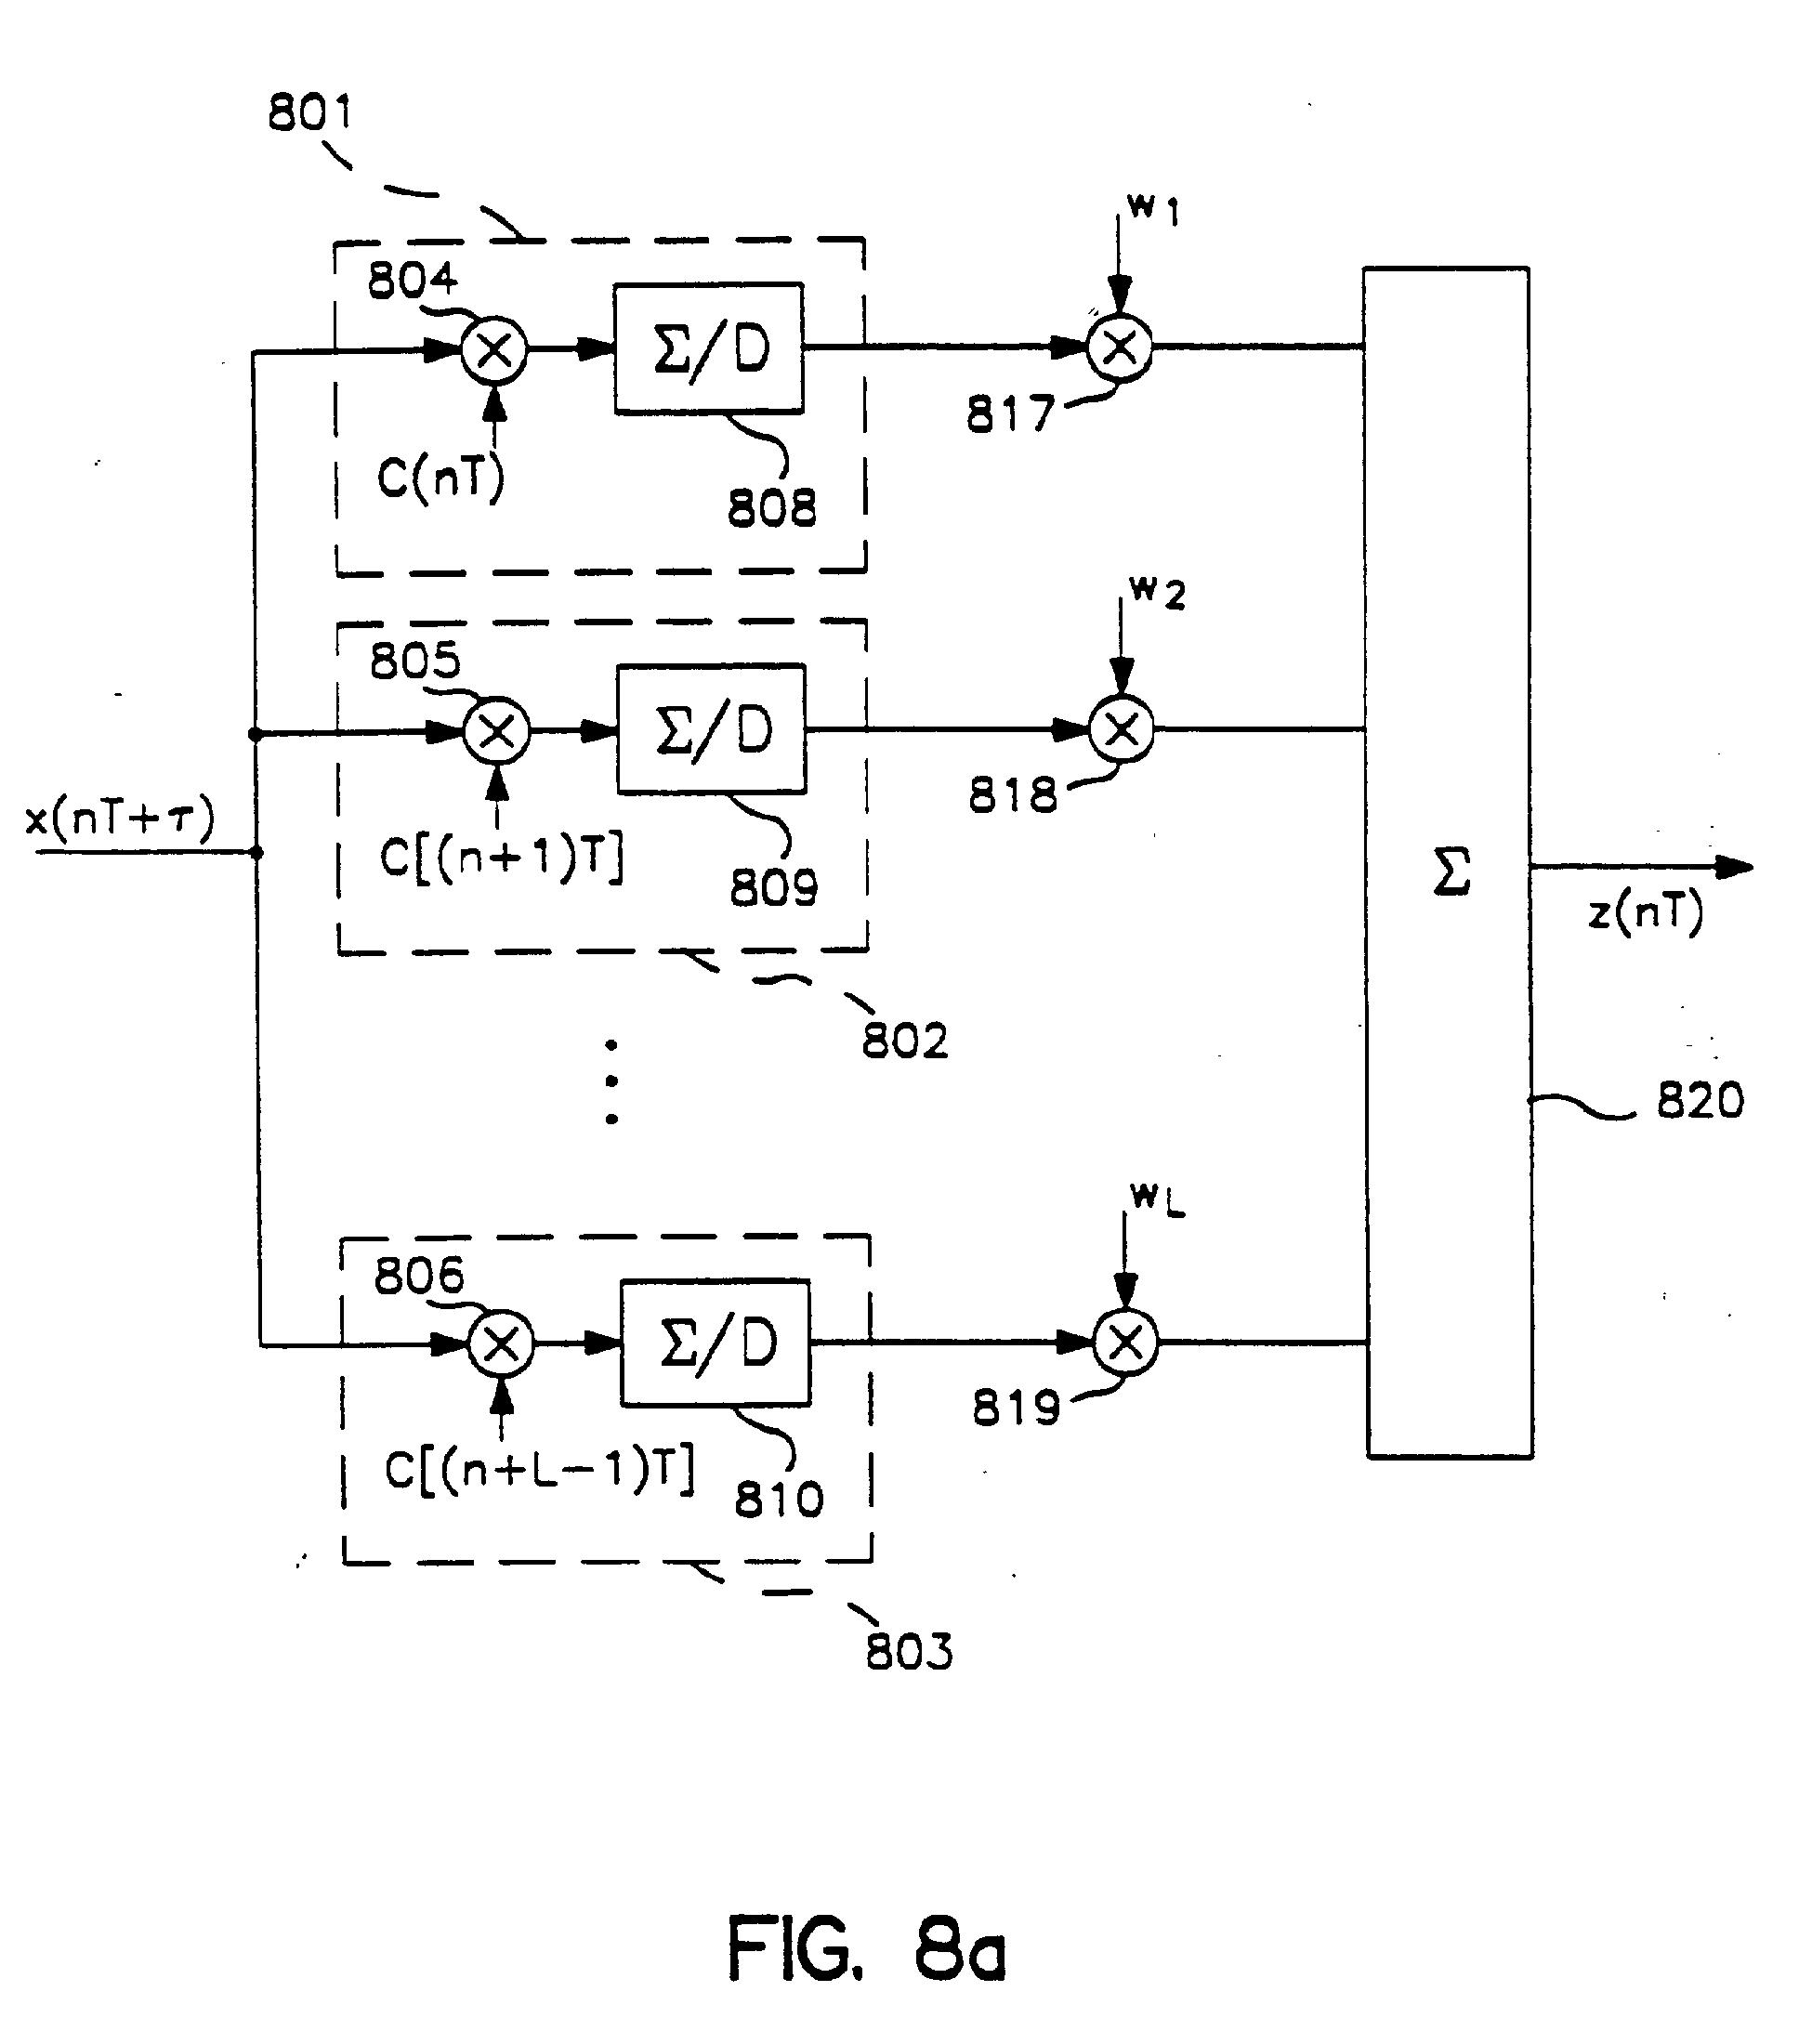 da8f98e 159 69 3 193 trailer country c2 bb wiring diagram  trailer country c2 bb wiring diagram #2